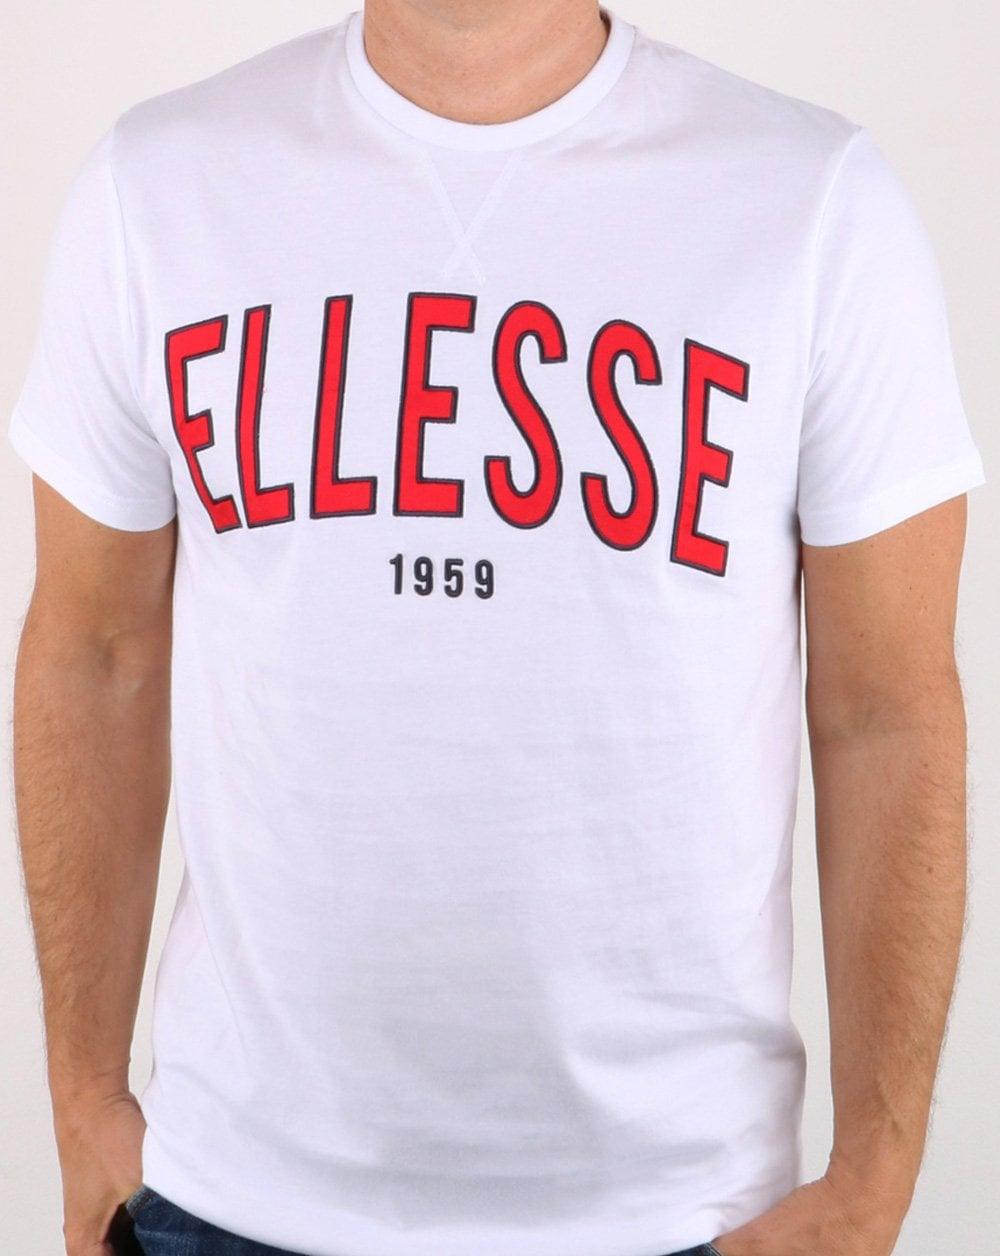 b03e87f4 Ellesse 90's Outline T Shirt White   80s casual classics